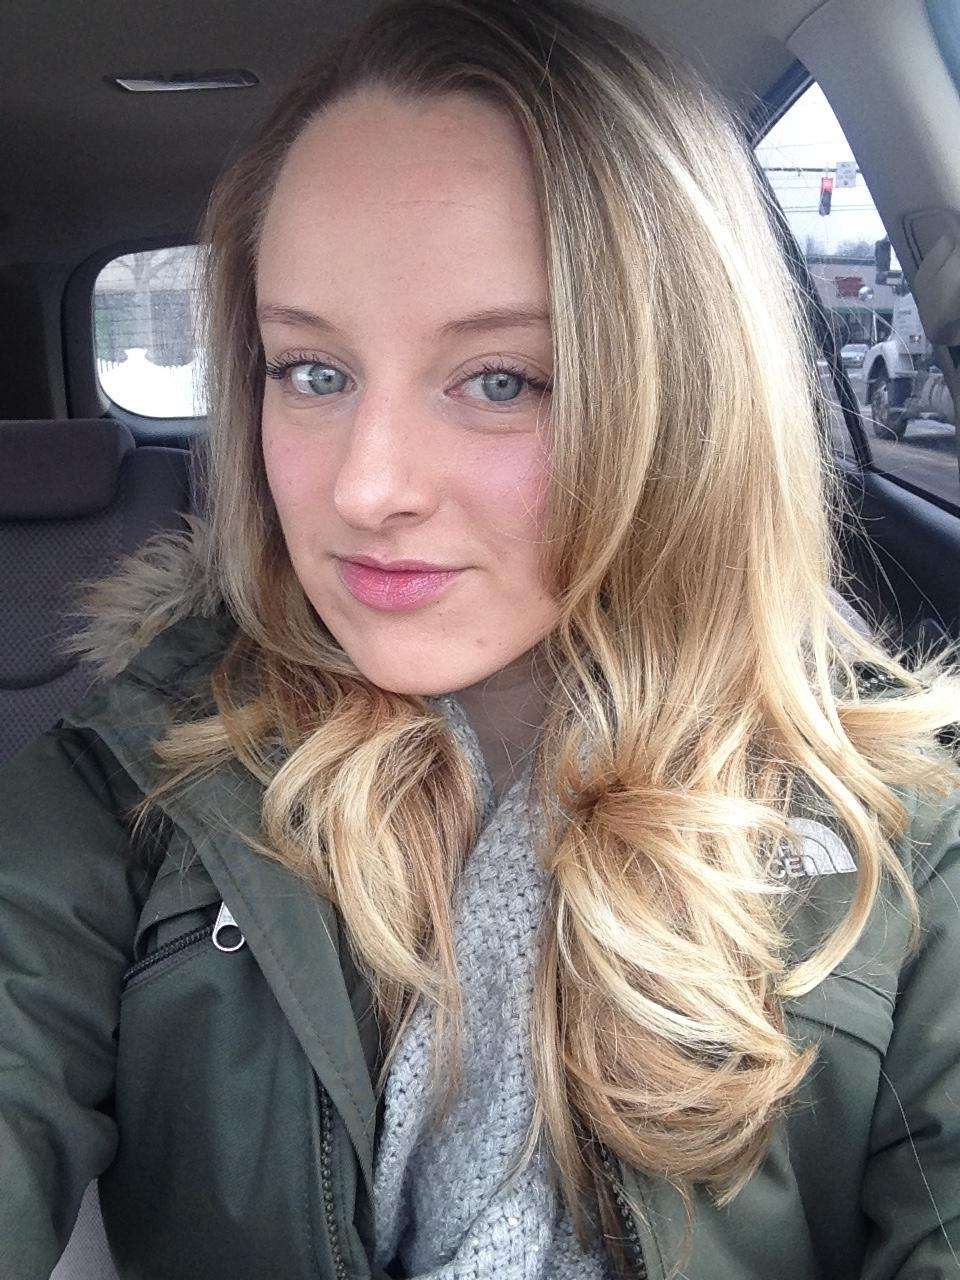 Bio: Kaydi is Newsday.com's Entertainment News Manager. She